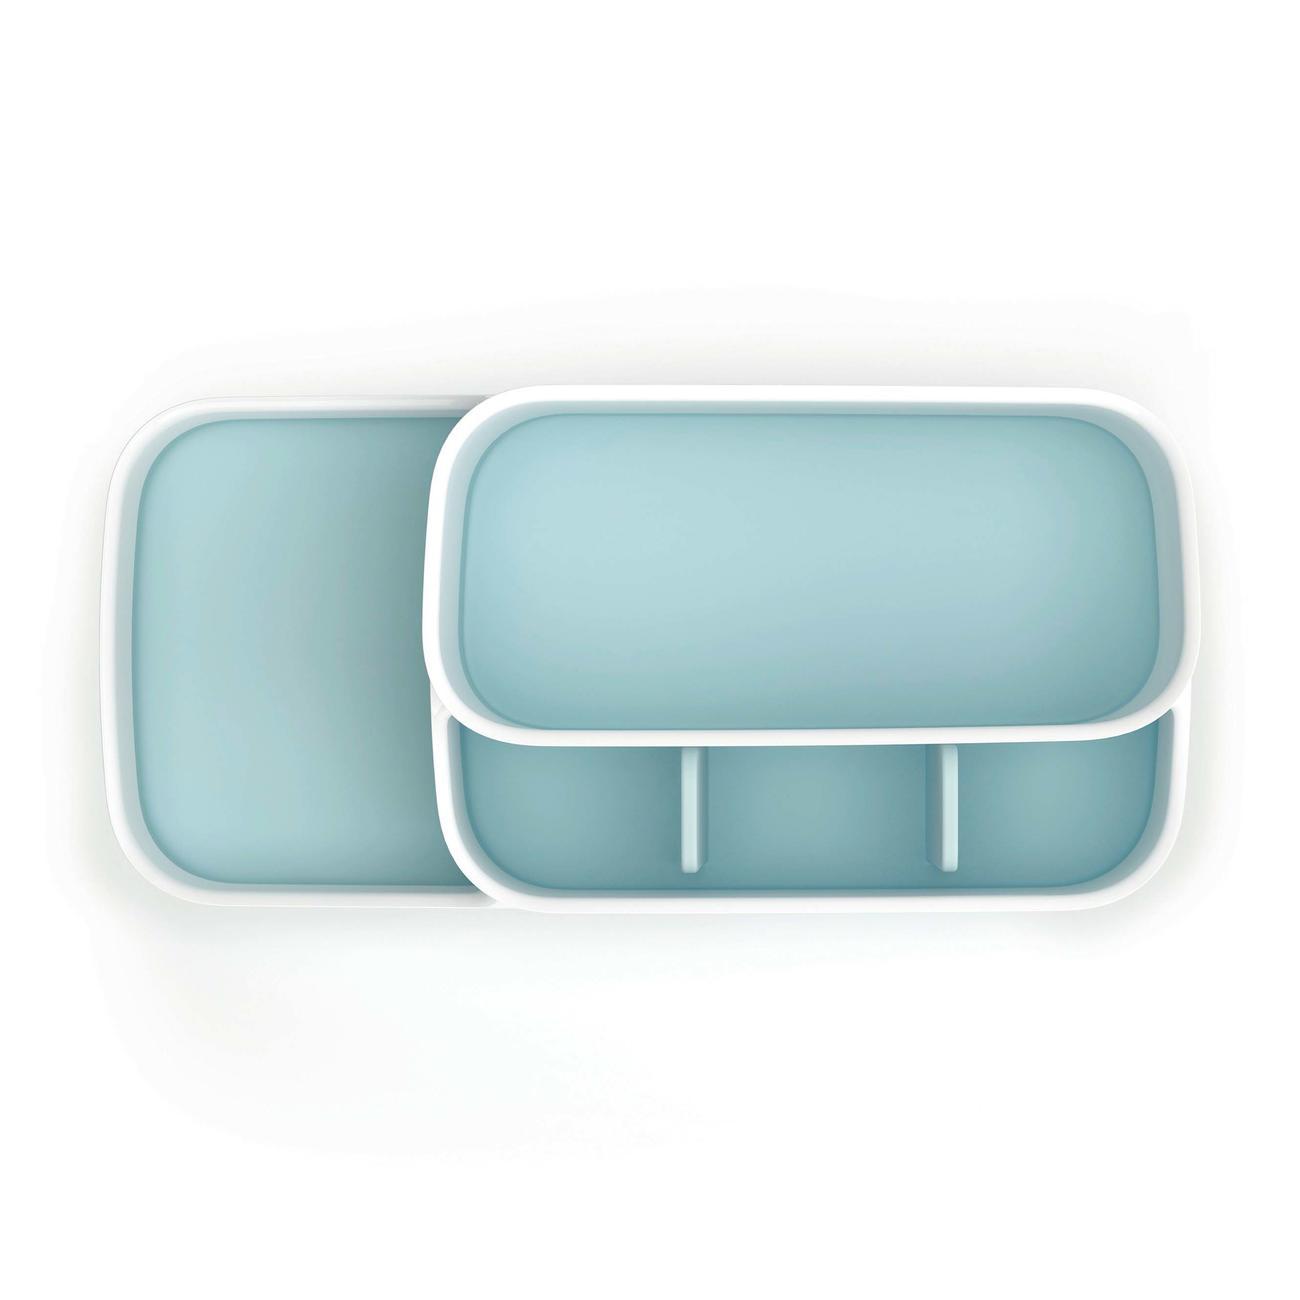 Buy Joseph Joseph Bathroom Caddy online